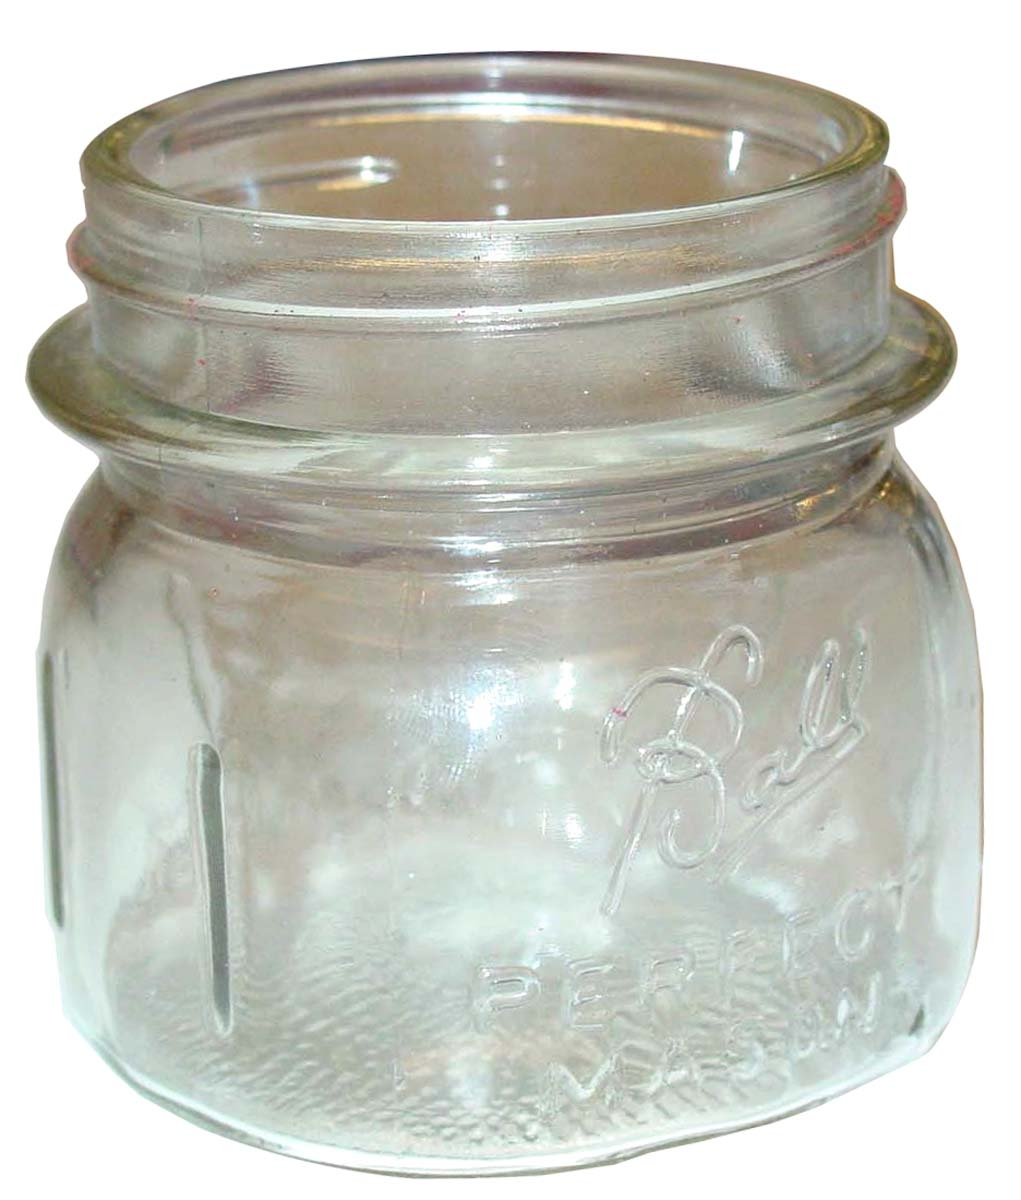 DONALDSON GLASS DUST JAR